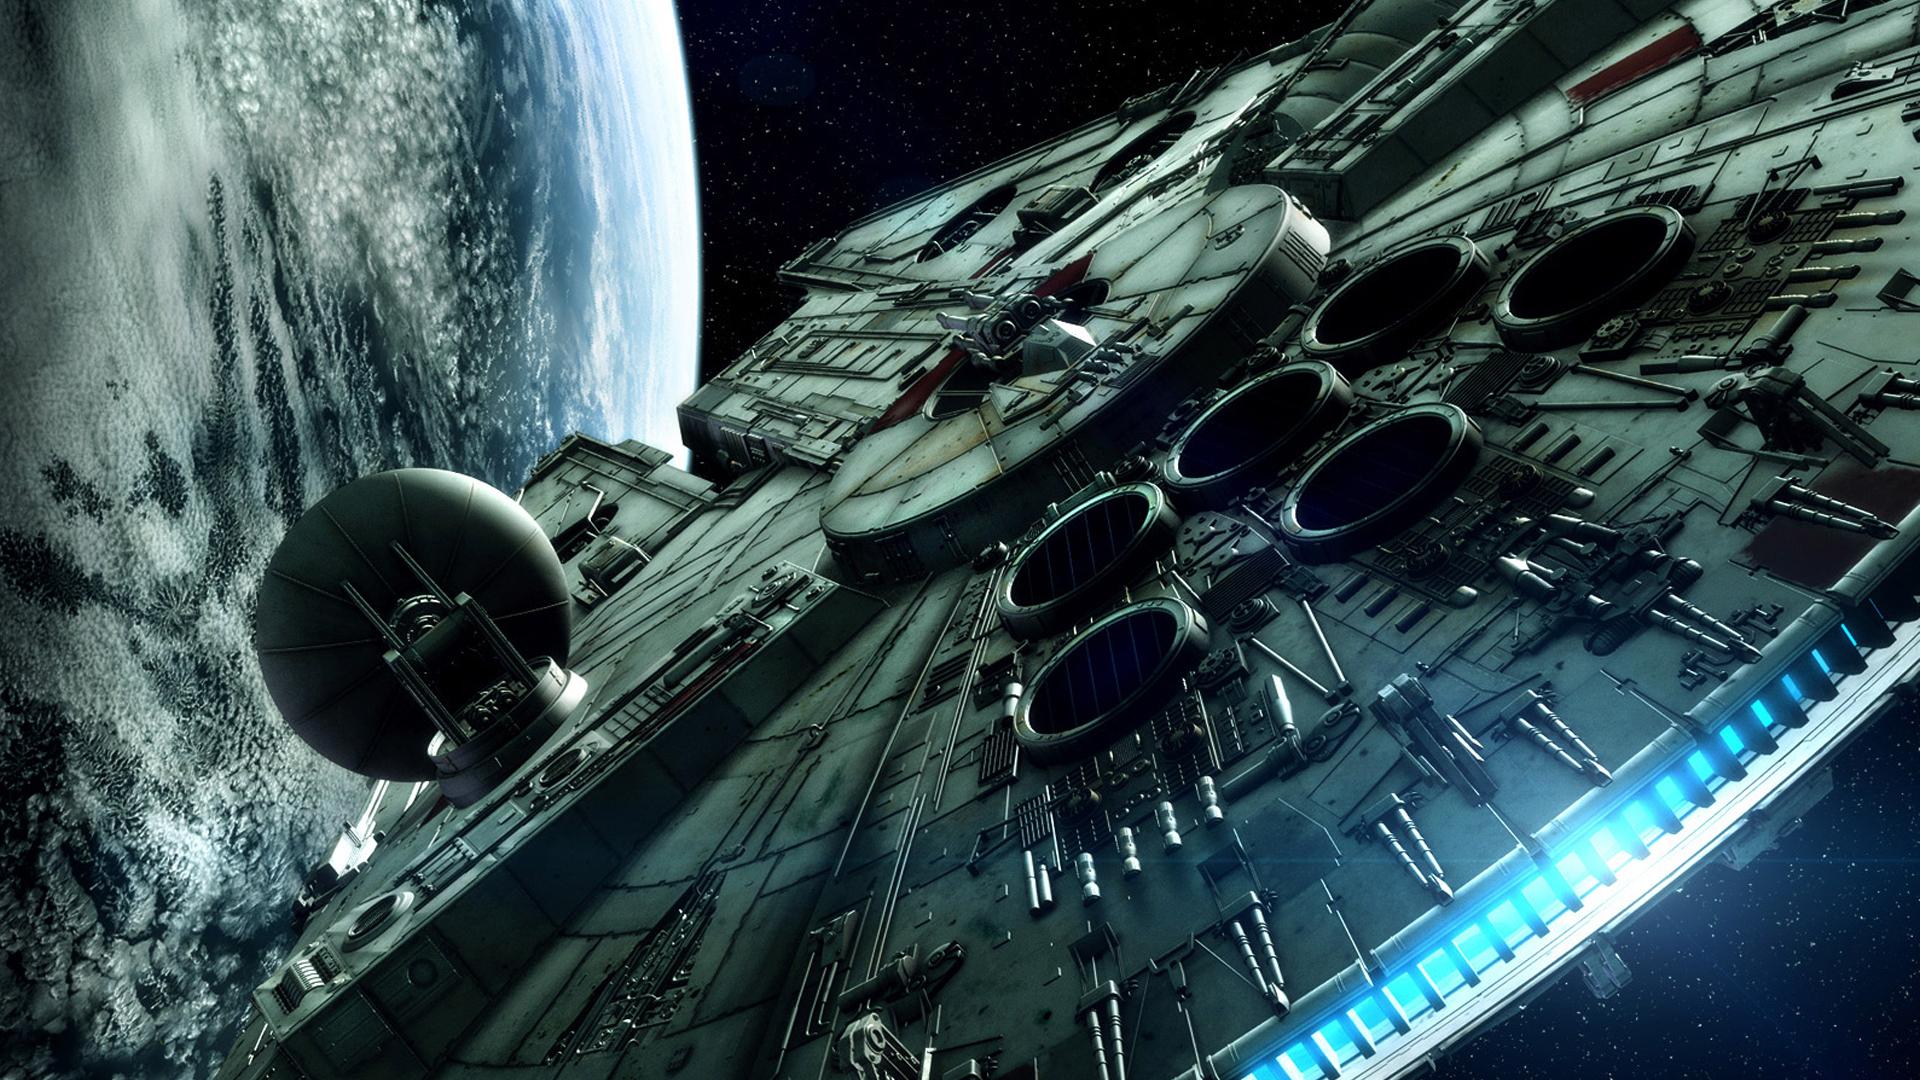 Download Star Wars Wallpaper Hd   Techlogitic 1920x1080